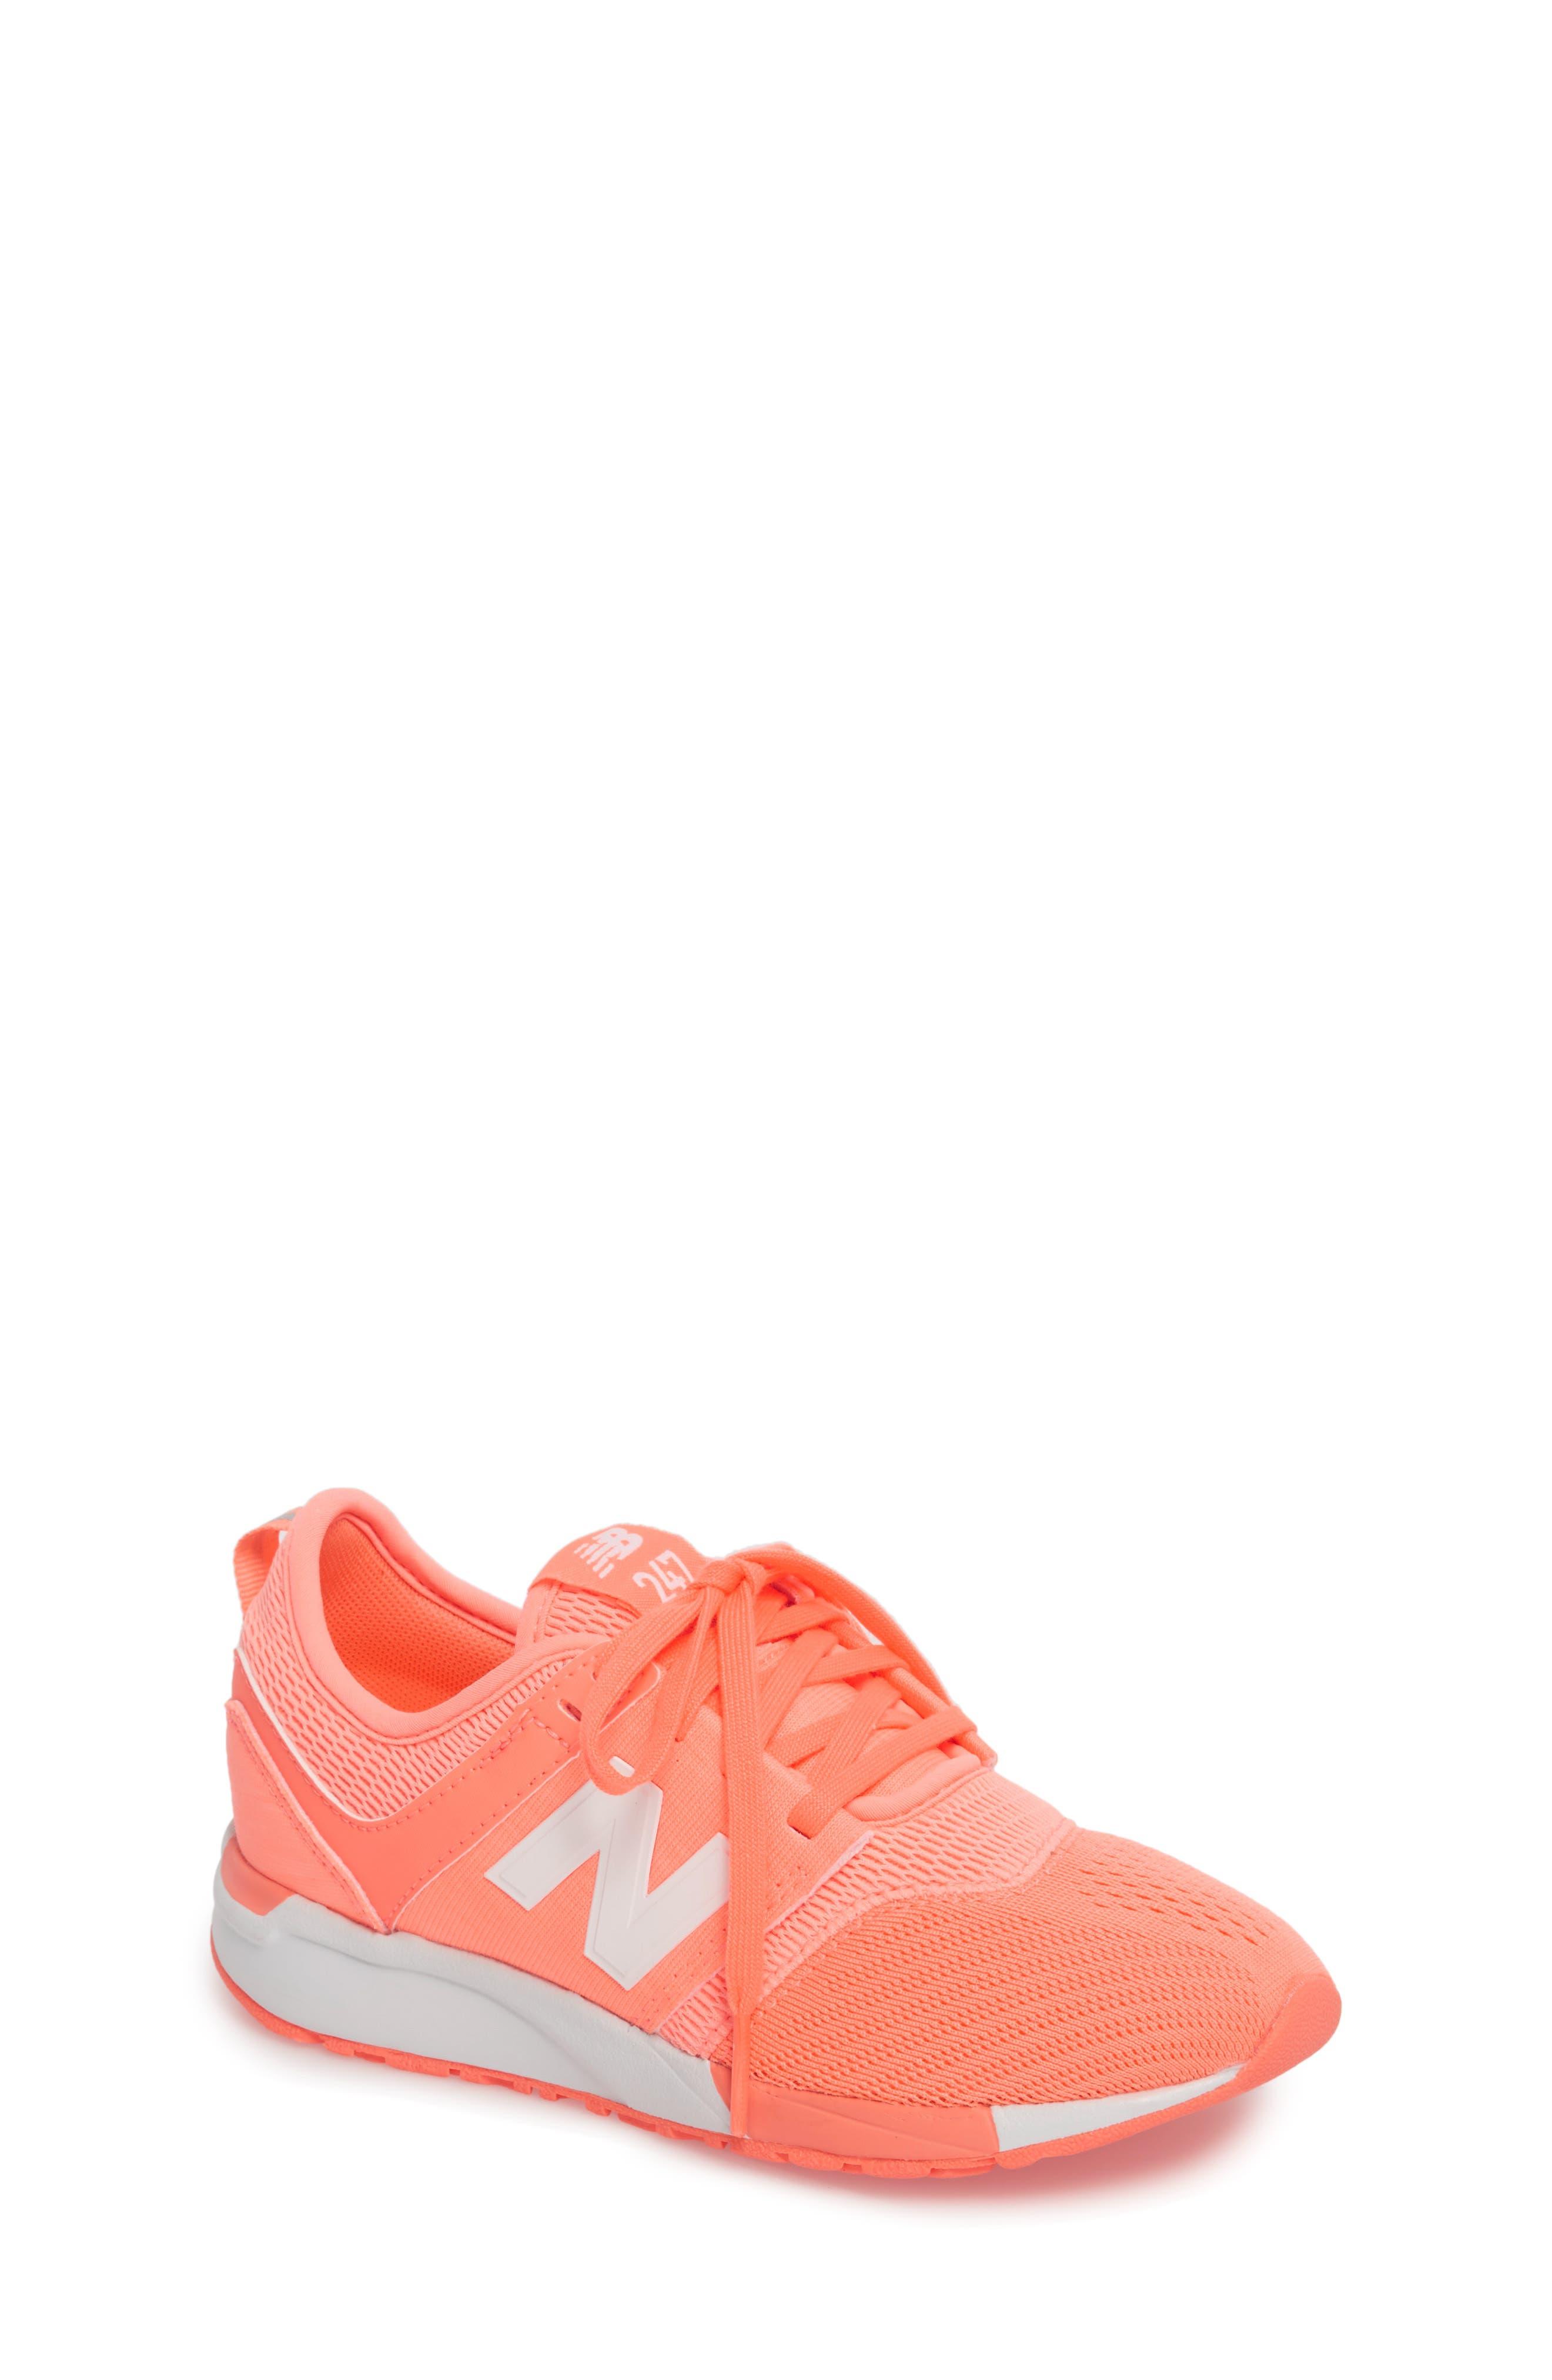 New Balance 247 Sport Sneaker (Baby, Walker, Toddler, Little Kid \u0026 Big